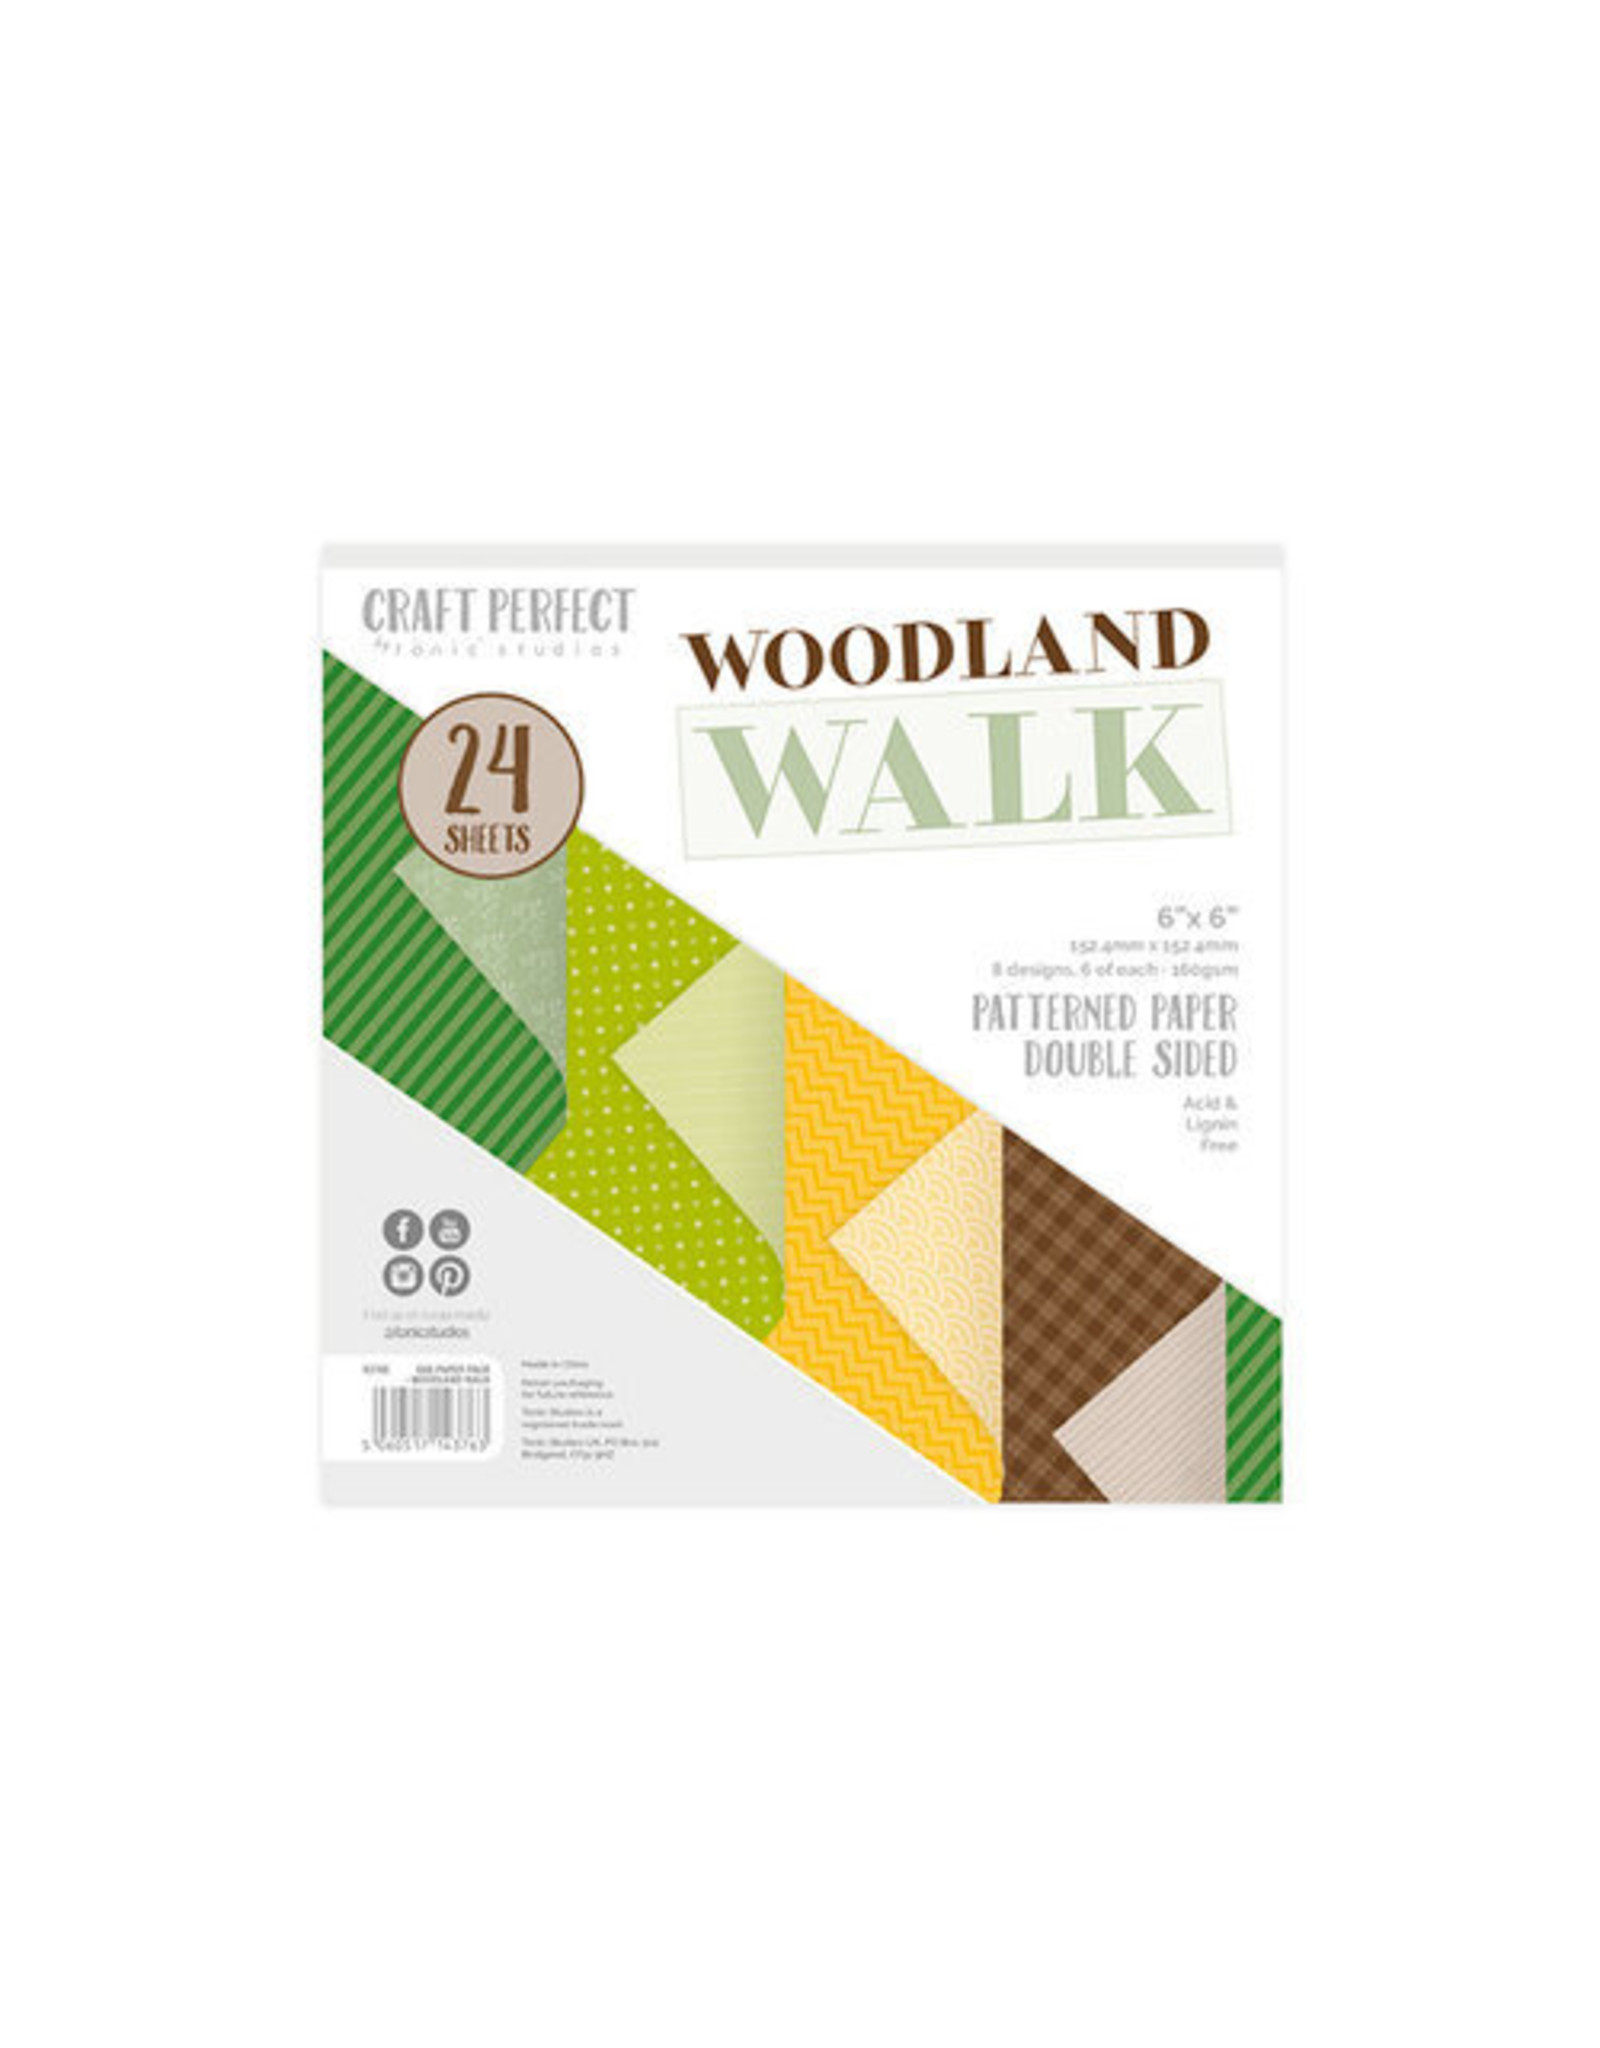 Craft Perfect Woodland Walk - 6x6 Paper Pad